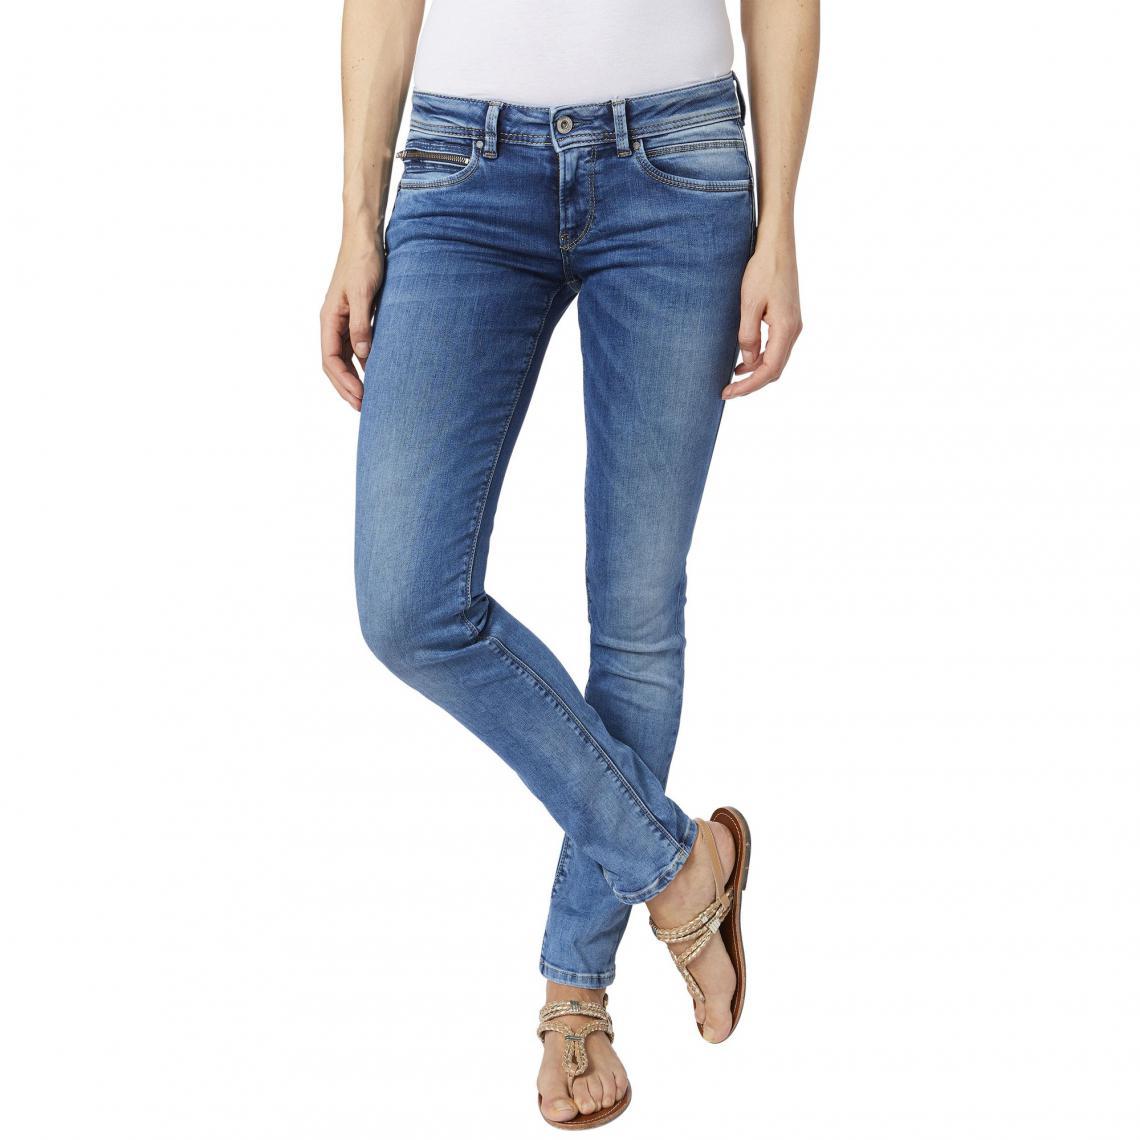 Femme New Brooke L32 Jeans Flex Medium Slim Power Jean Pepe vRqYPBpnw